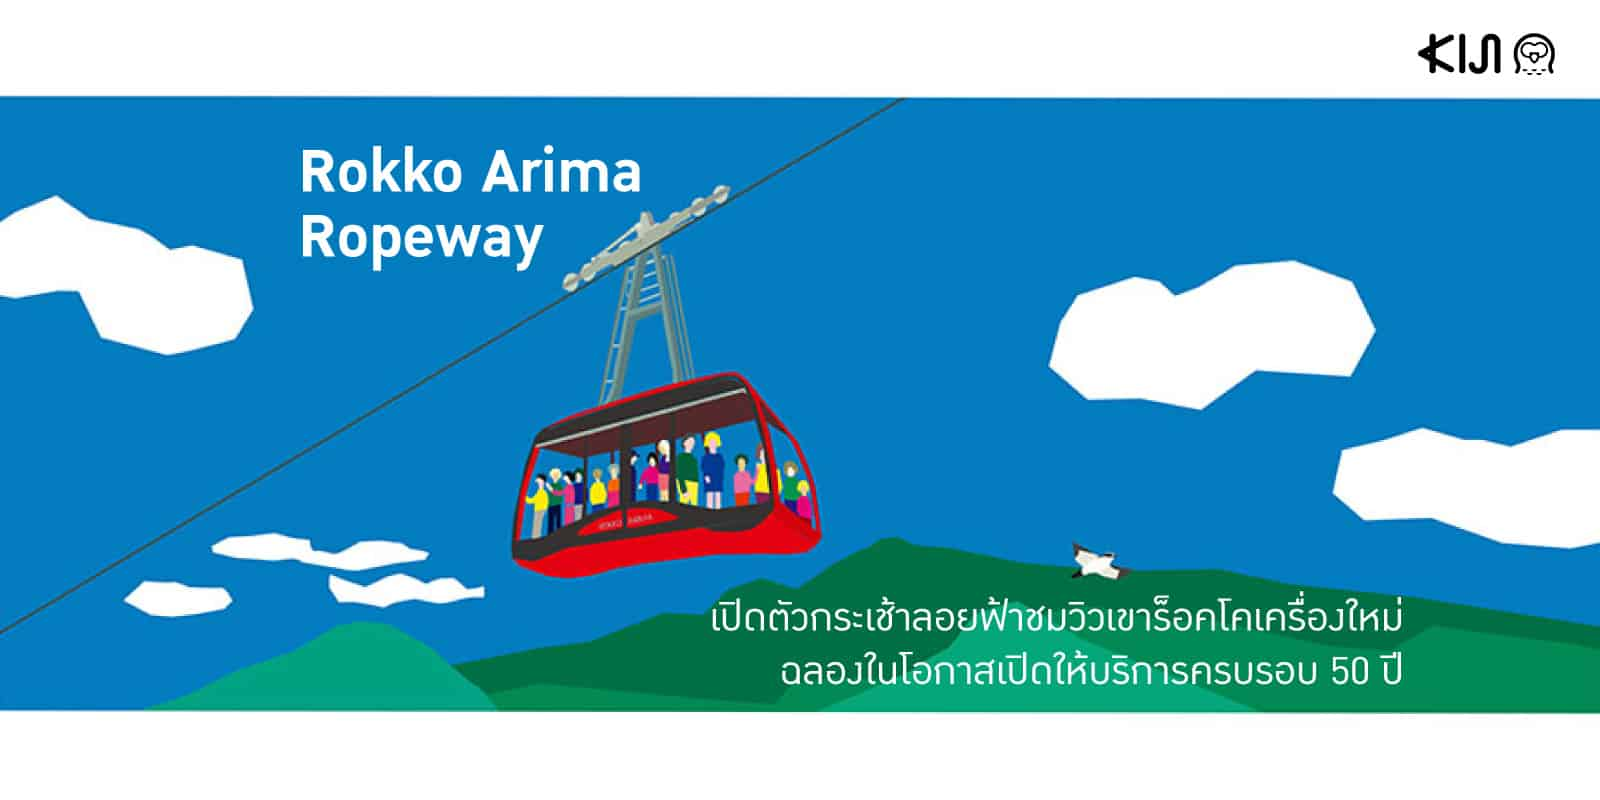 Rokko Arima Ropeway กระเช้าใหม่เชื่อมต่อระหว่างภูเขาร็อคโคและอาริมะออนเซ็น